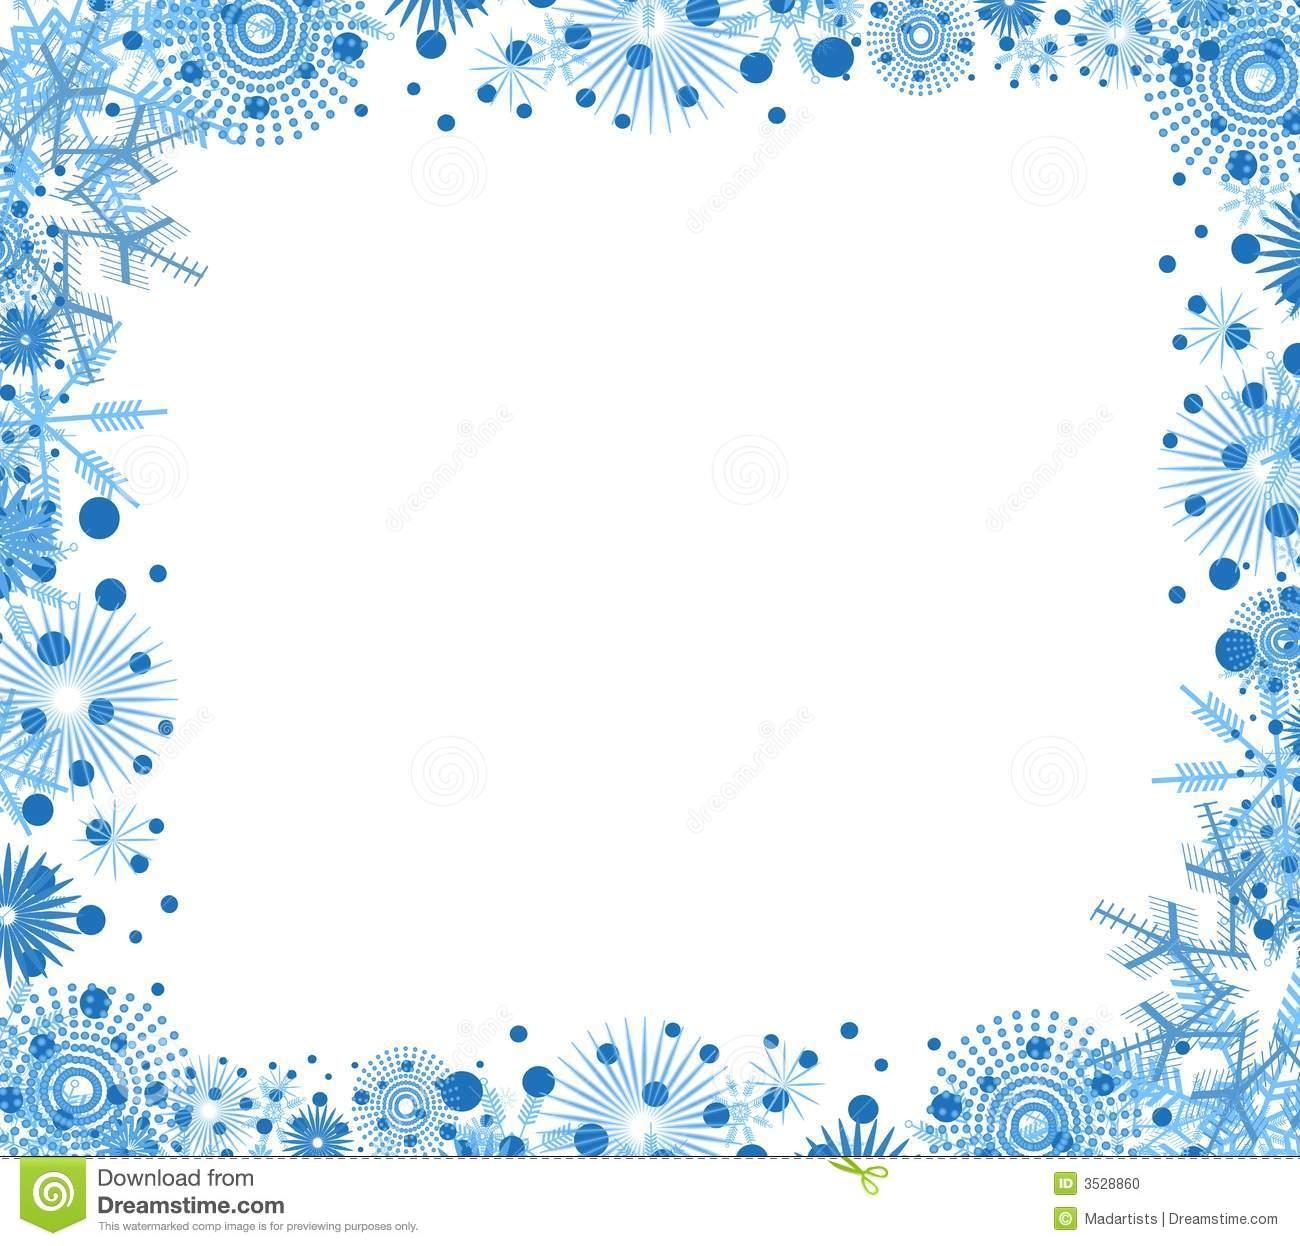 Download high res images of modern clipart borders svg download 92+ Holiday Clip Art Borders | ClipartLook svg download